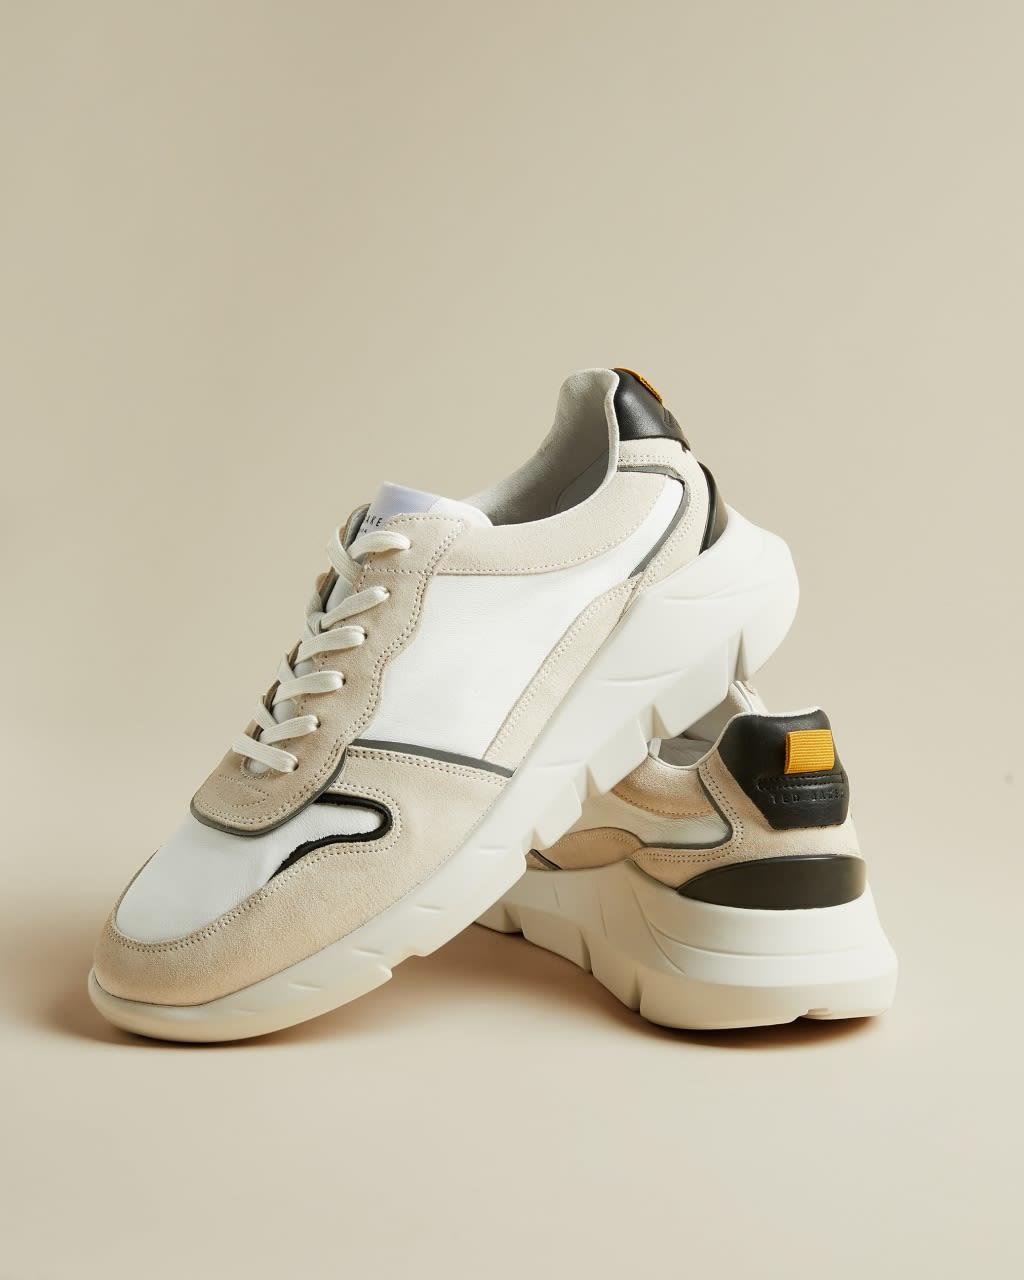 Ted Baker Colour Block Leather Trainers  - Ecru - Size: UK 9 (EU 43)